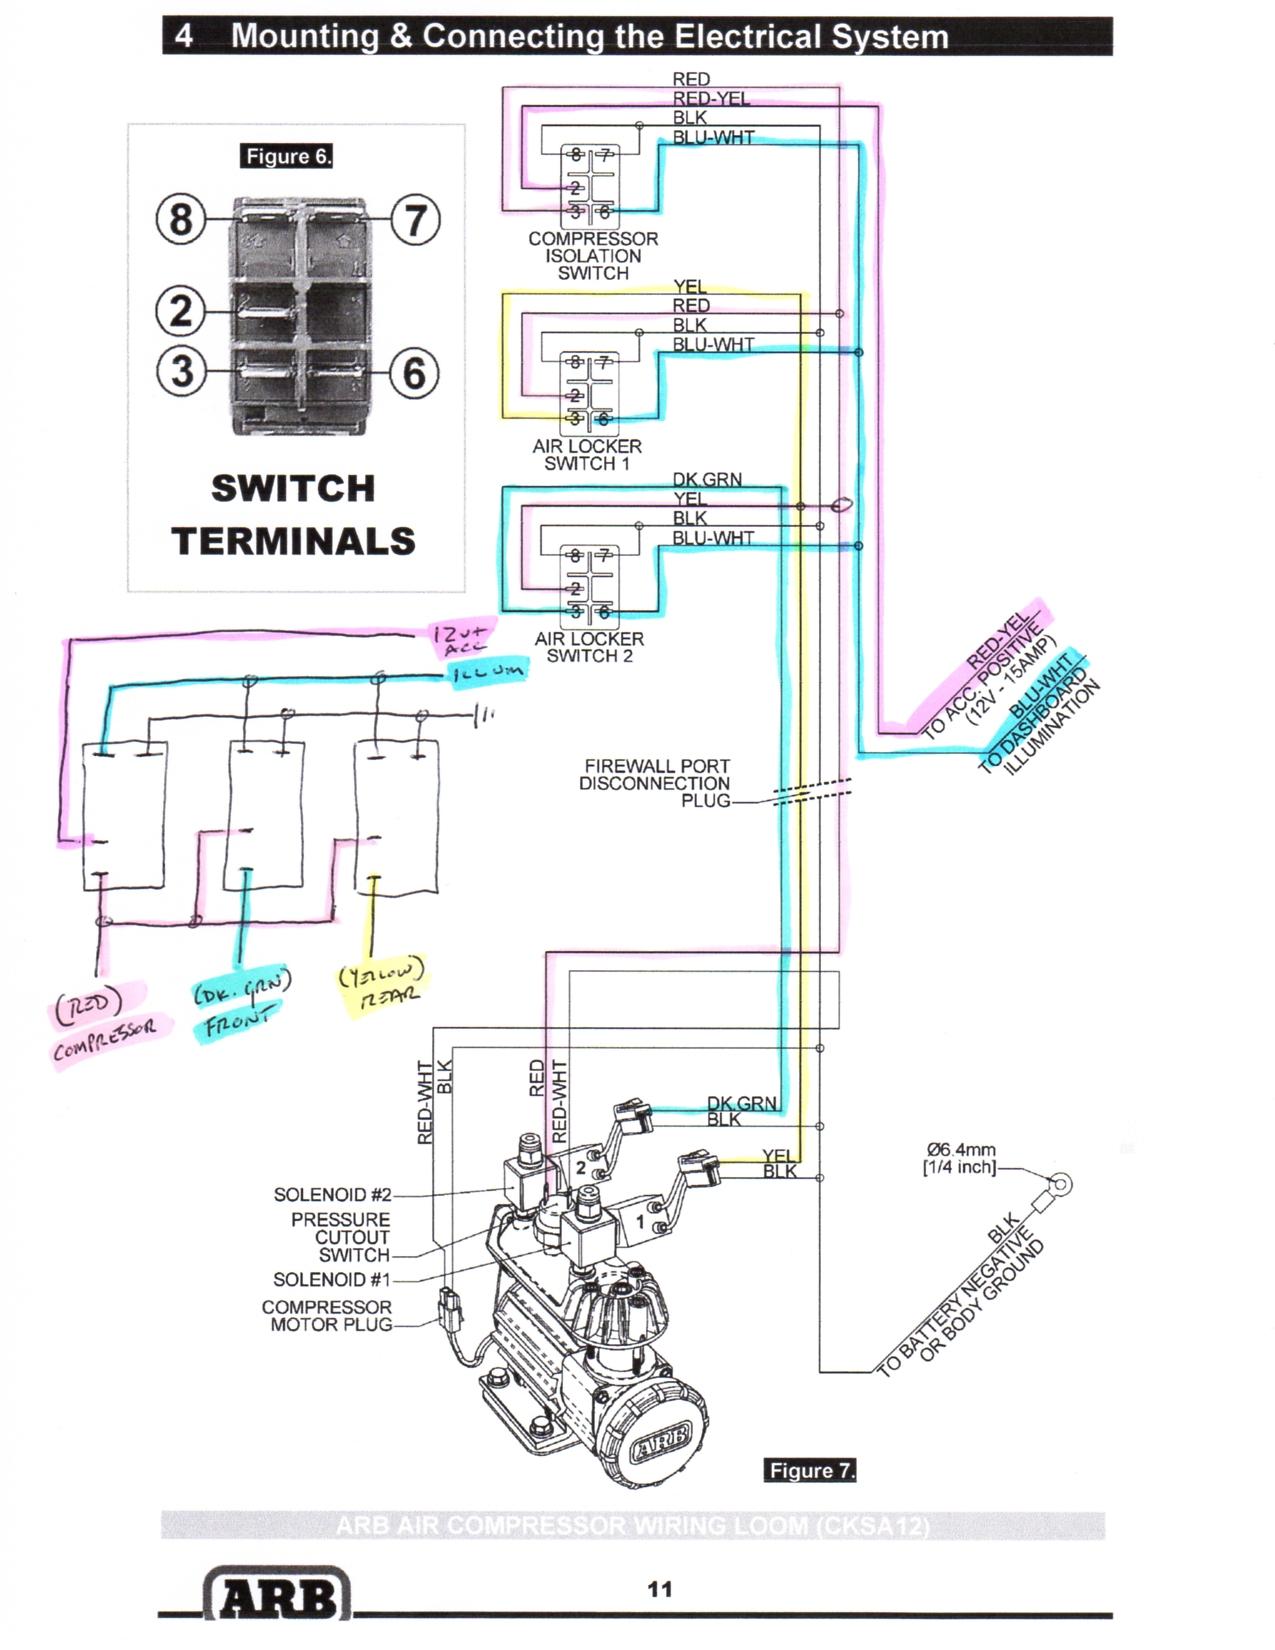 [DIAGRAM_38IS]  XL_1401] Jeep Locker Wiring Diagram Electric Free Diagram | Arb Locker Wiring Harness Diagram |  | Ivoro Cular Scata Odga Cette Pap Mohammedshrine Librar Wiring 101